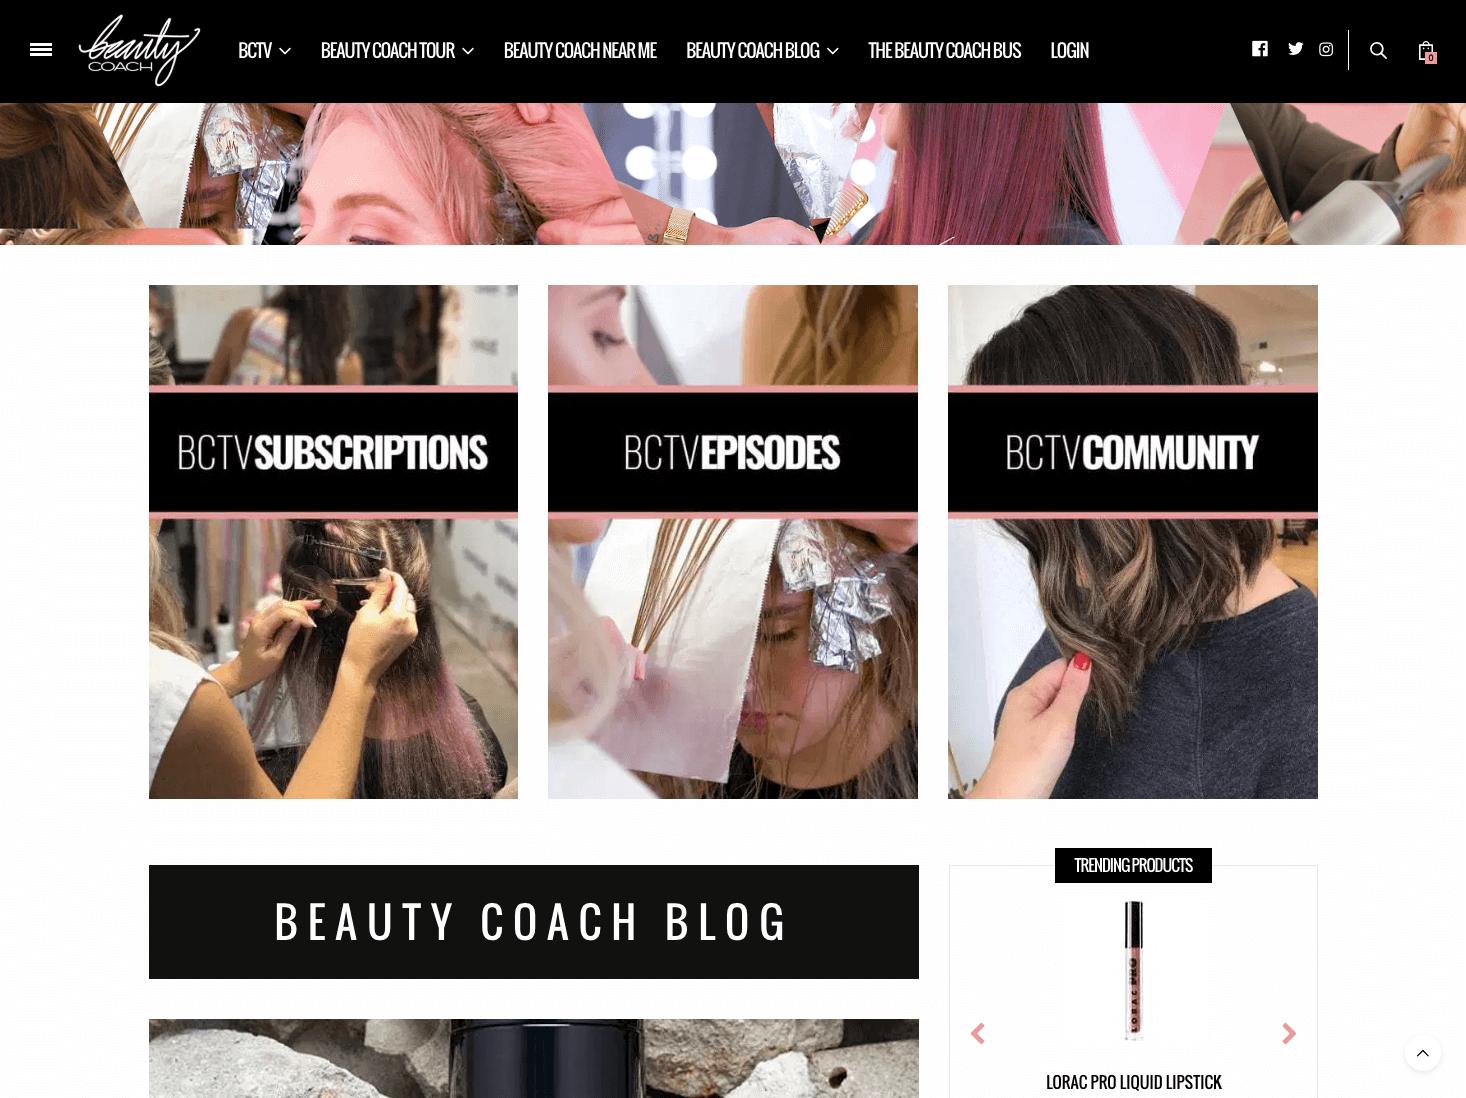 beautycoach.com